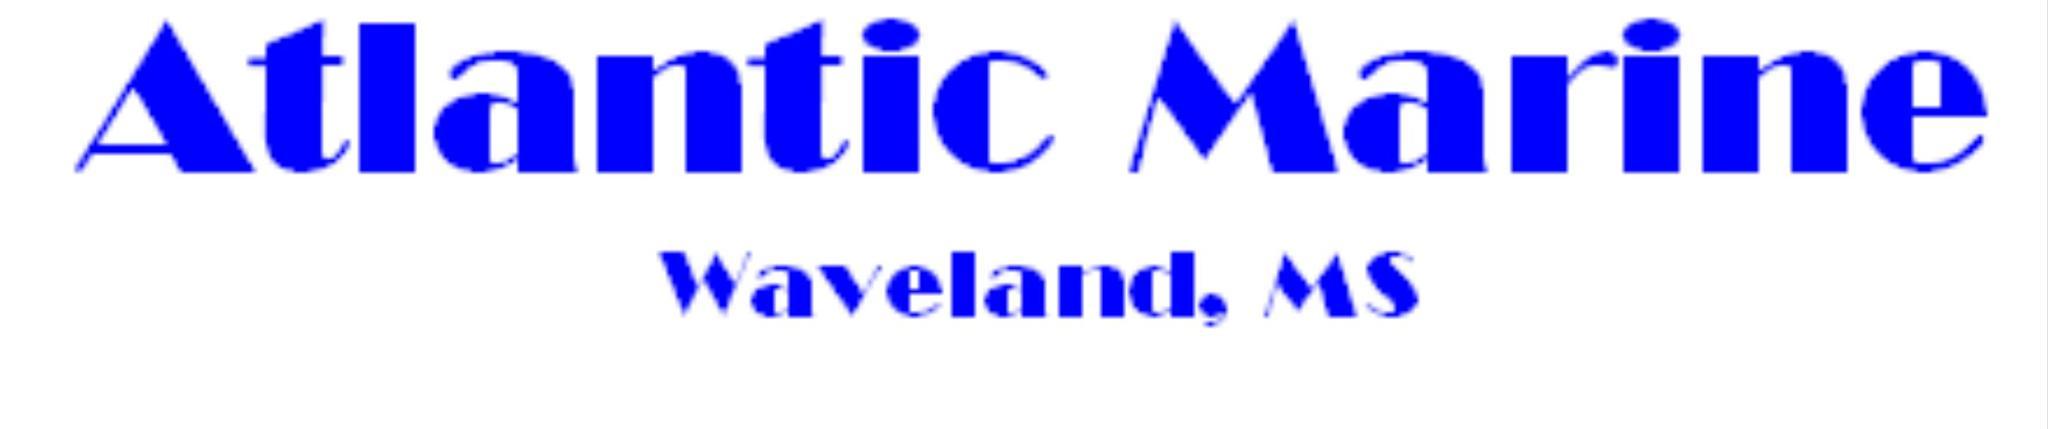 Atlantic Marine logo